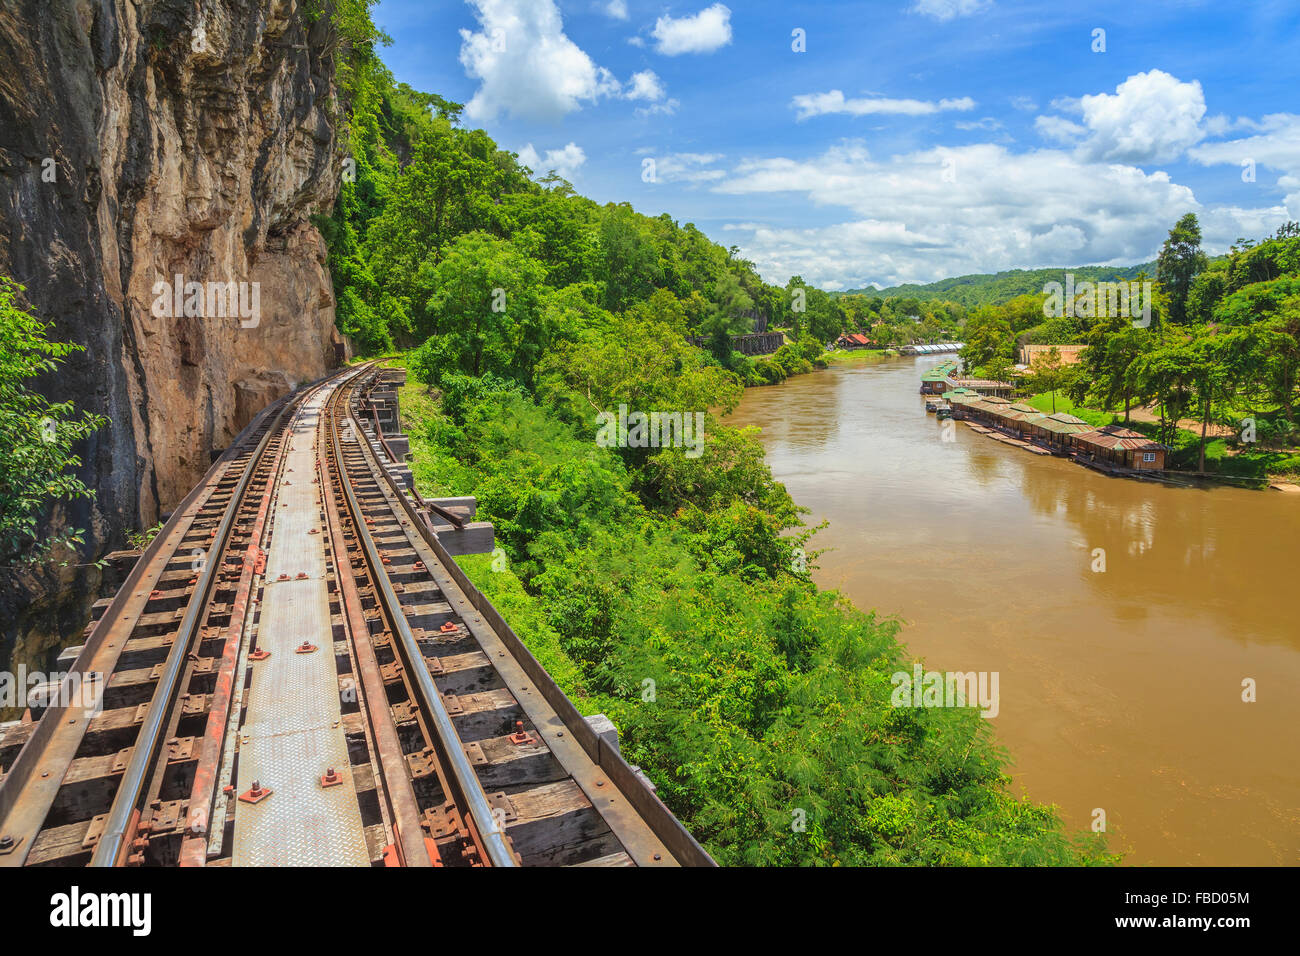 railwat track and river Kwai at Kanchanaburi - Stock Image